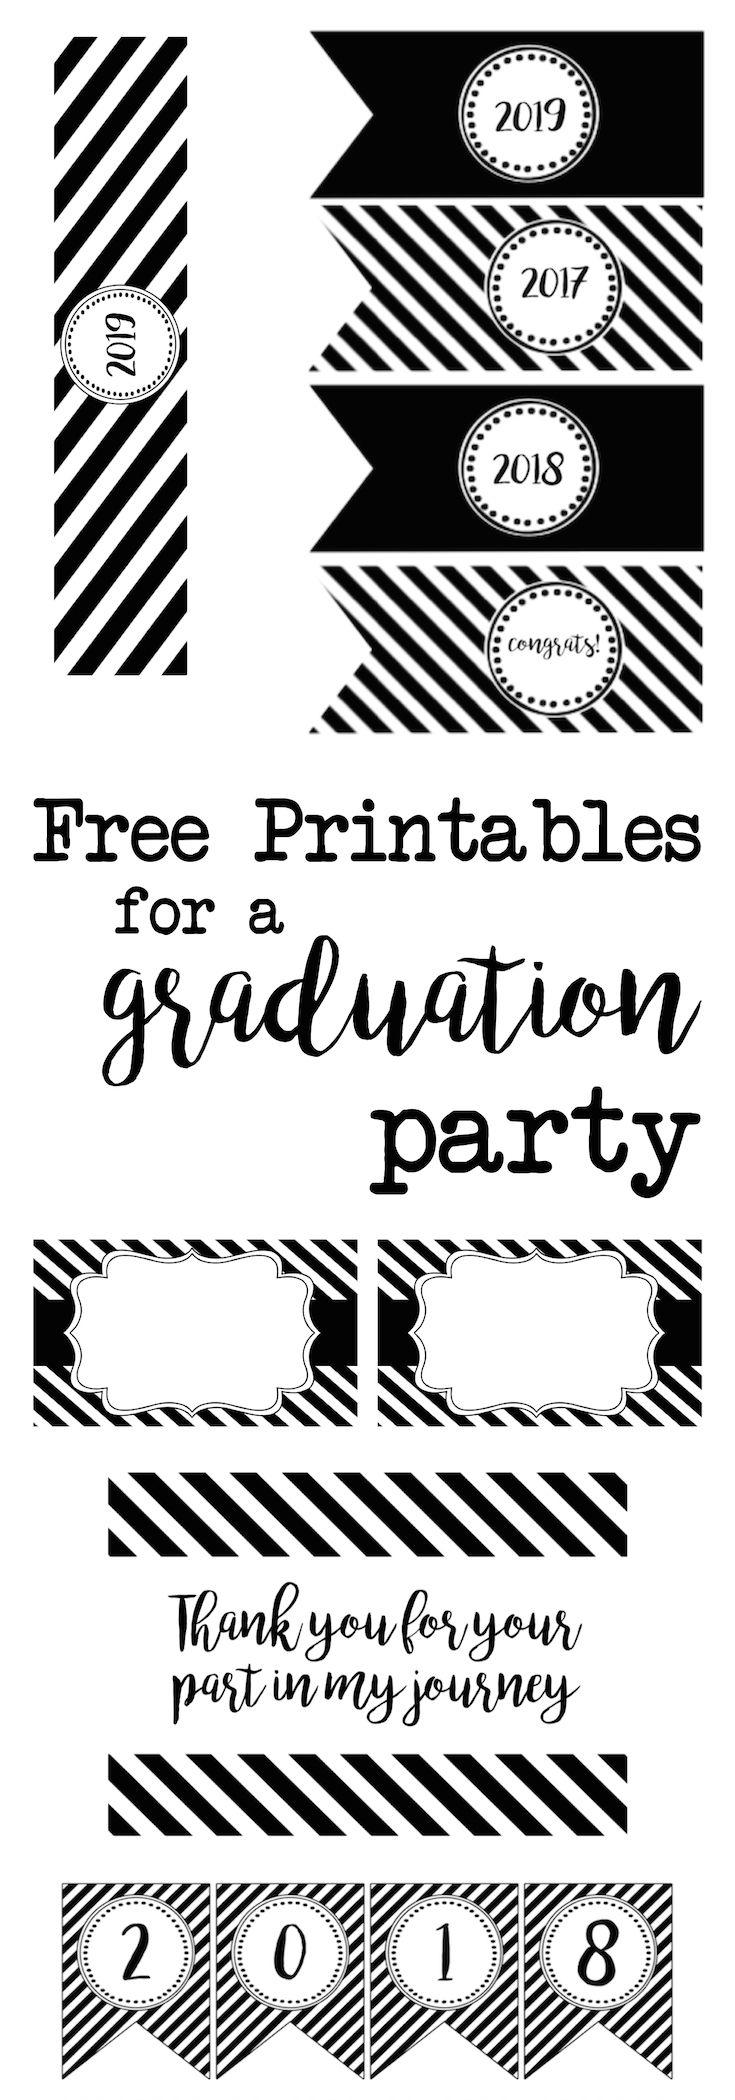 Graduation Party Free Printables | Free printables, Free and Grad ...